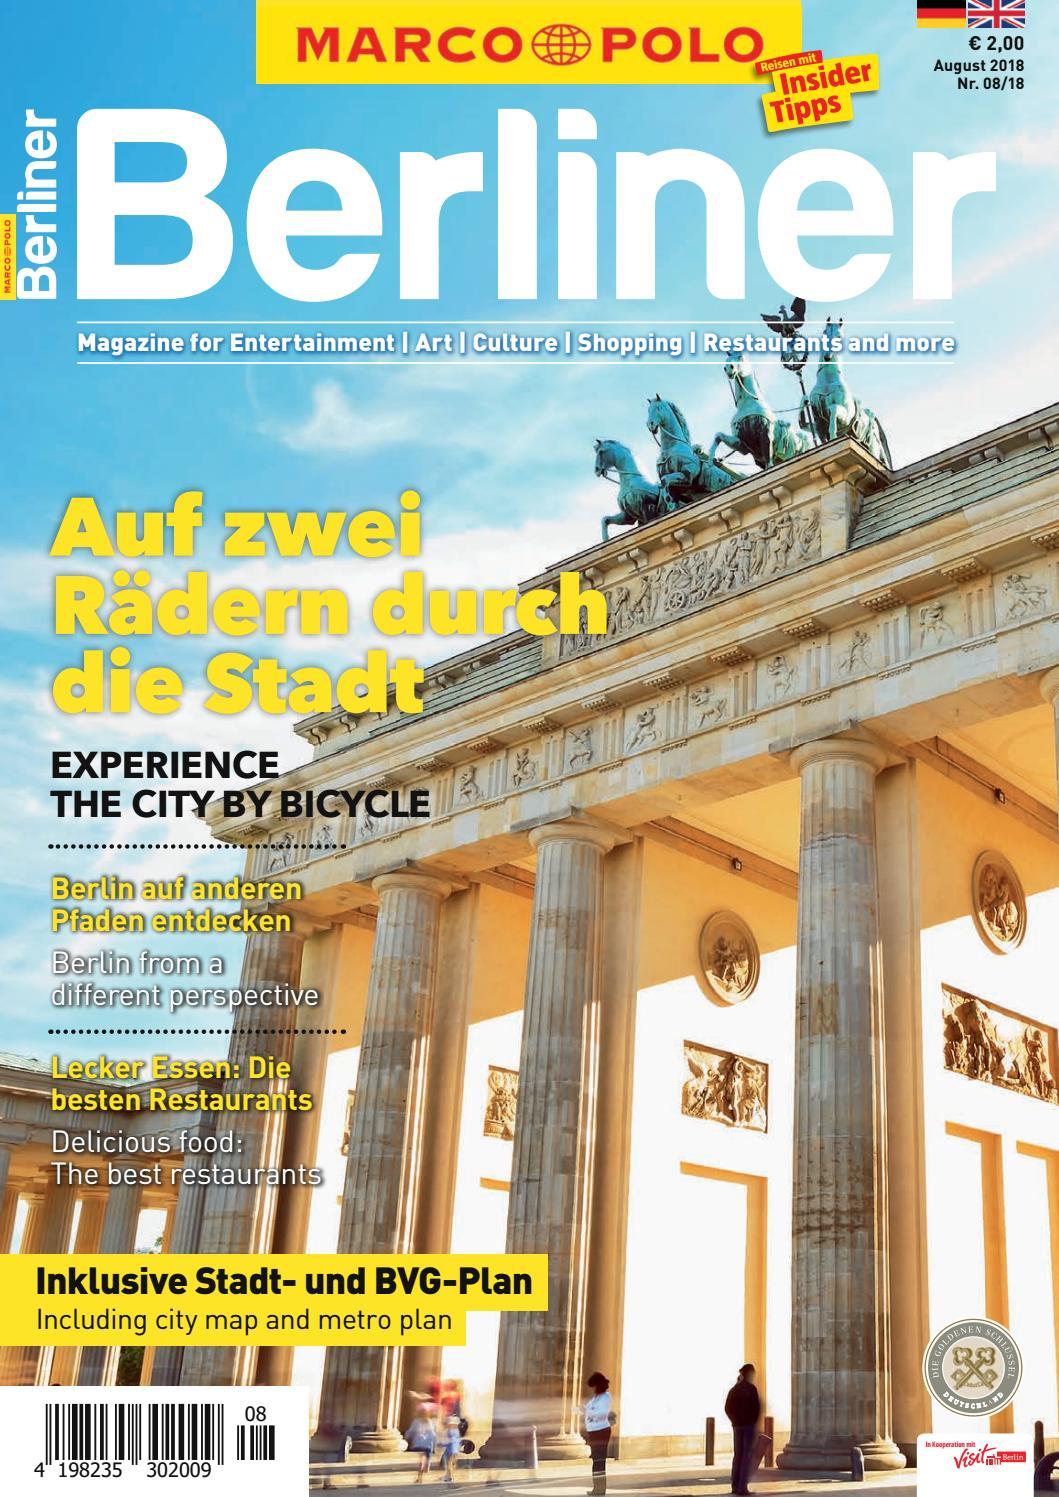 Marco Polo Auf zwei Raedern 08.2018 by Berlin Medien GmbH - issuu